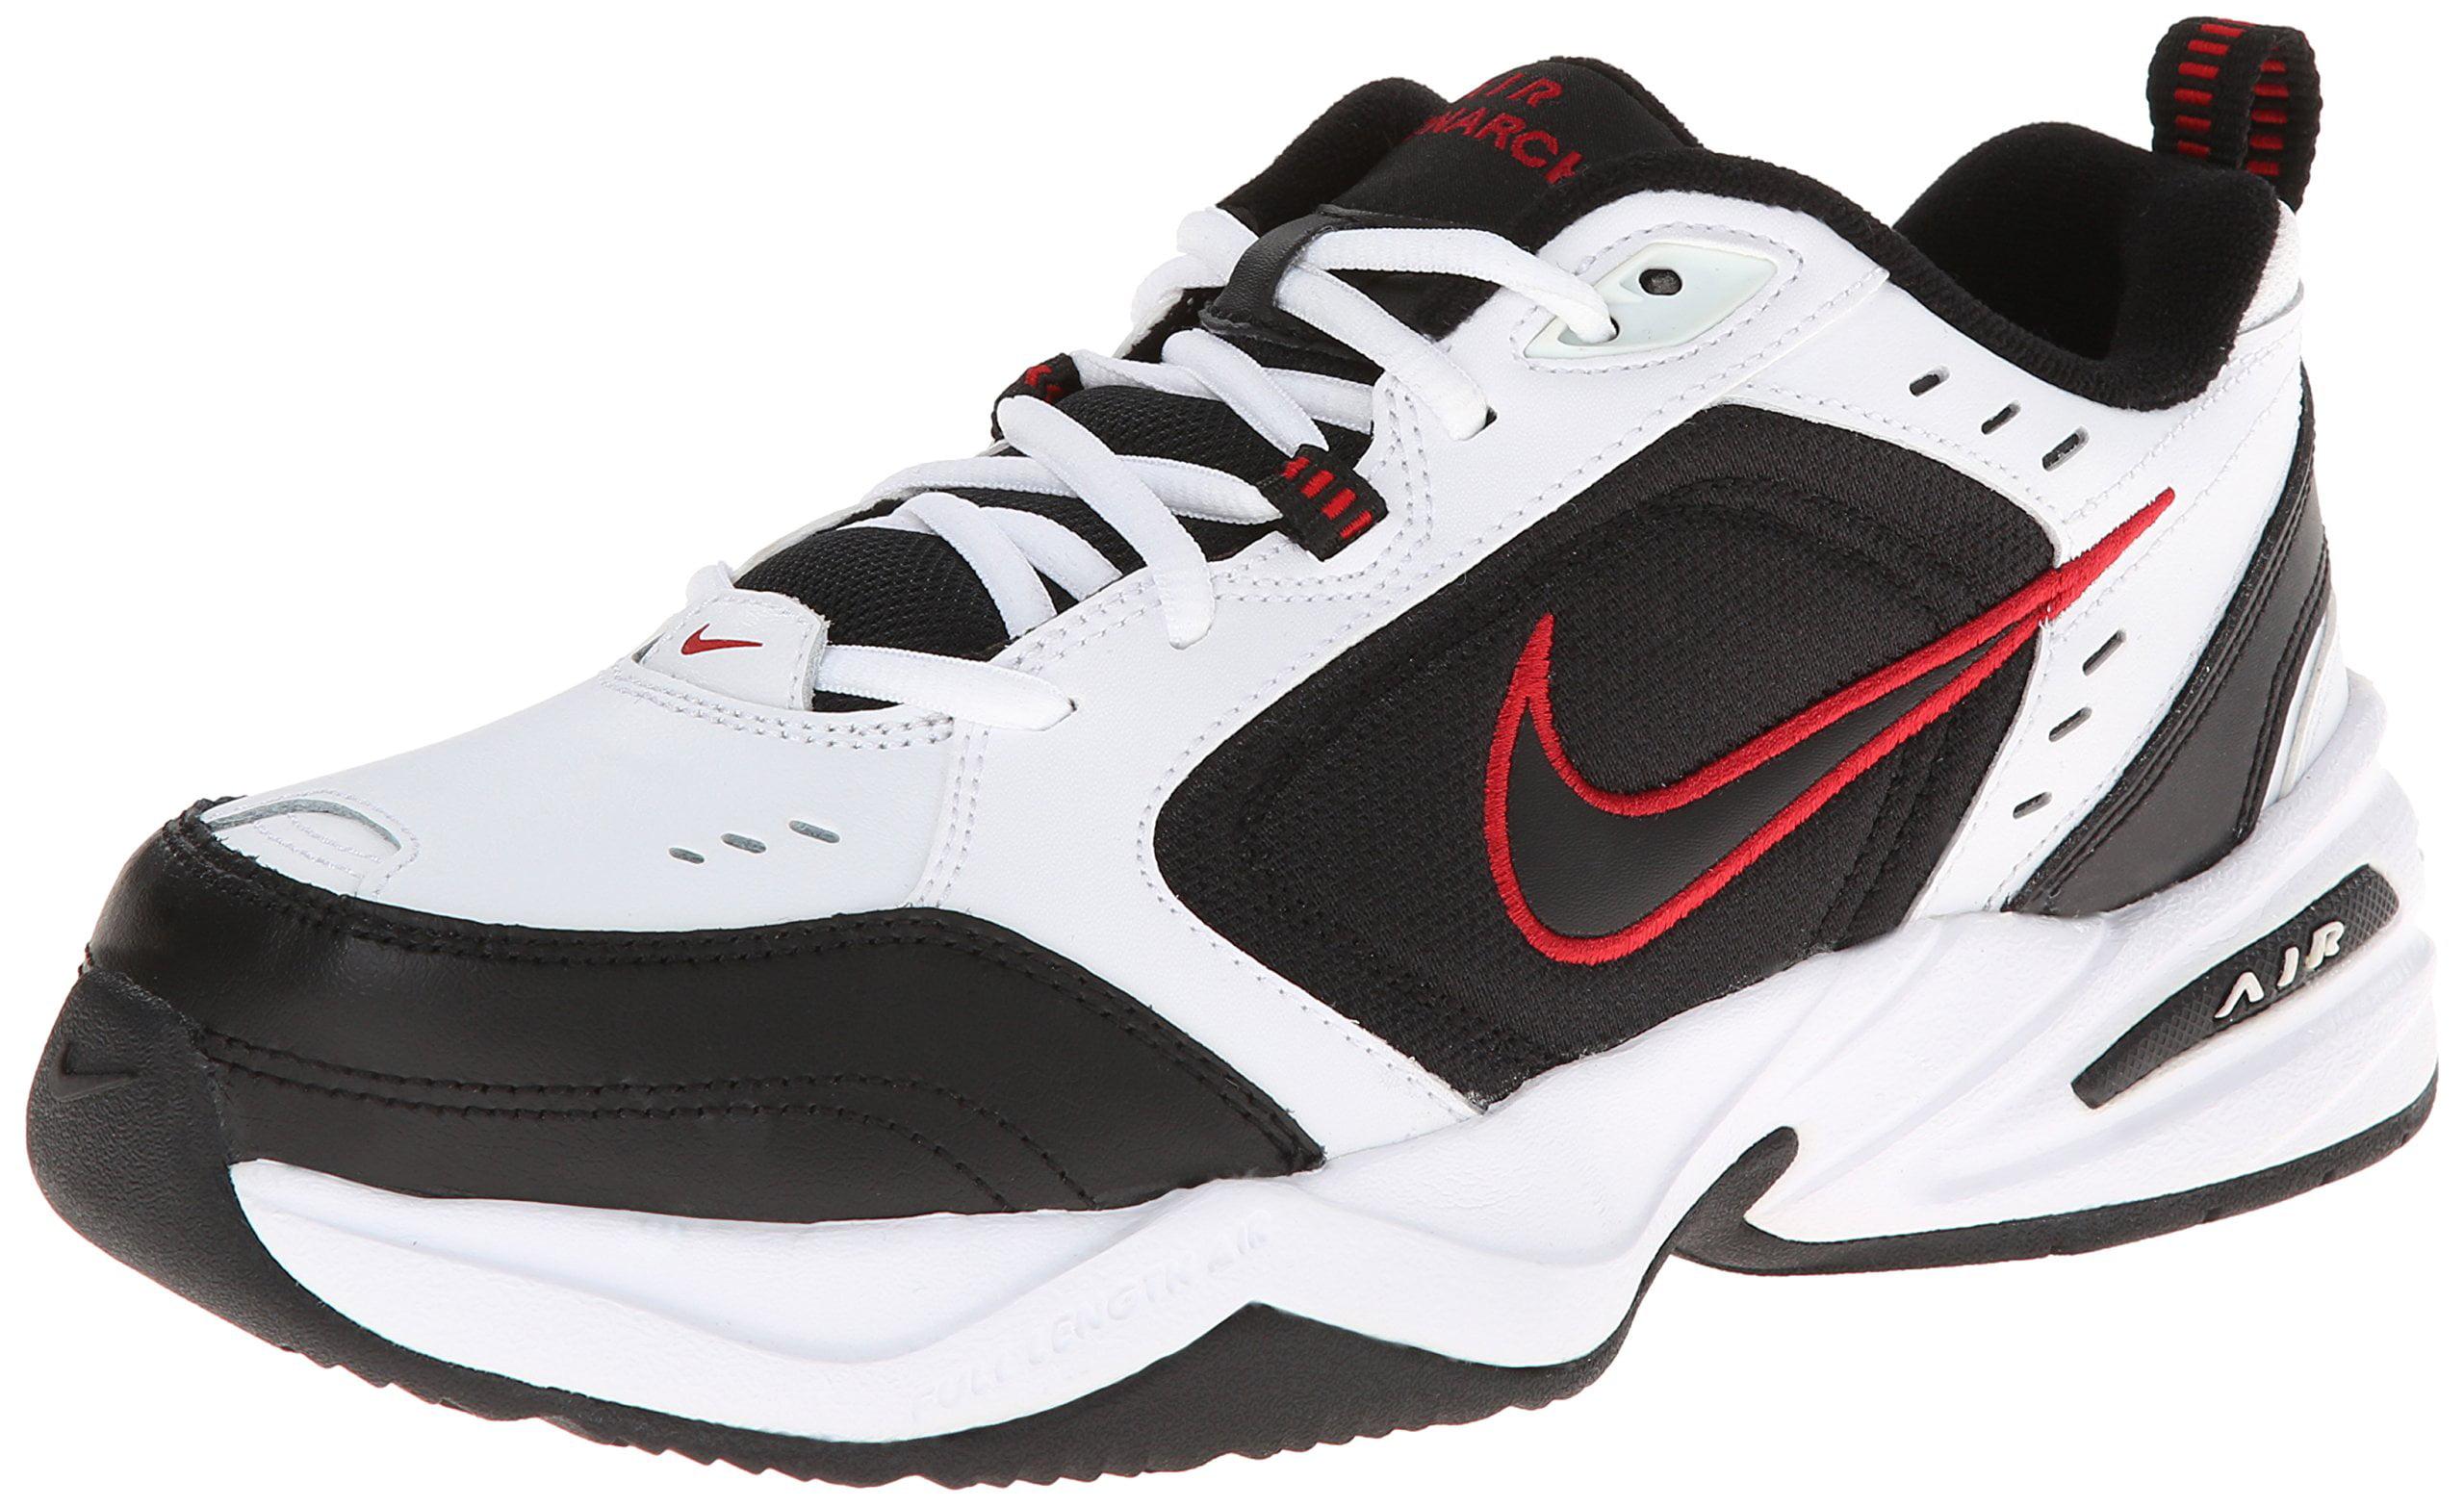 Nike 415445-101: Men's Air Monarch IV Cross Trainer Sneaker (10 D(M) US)